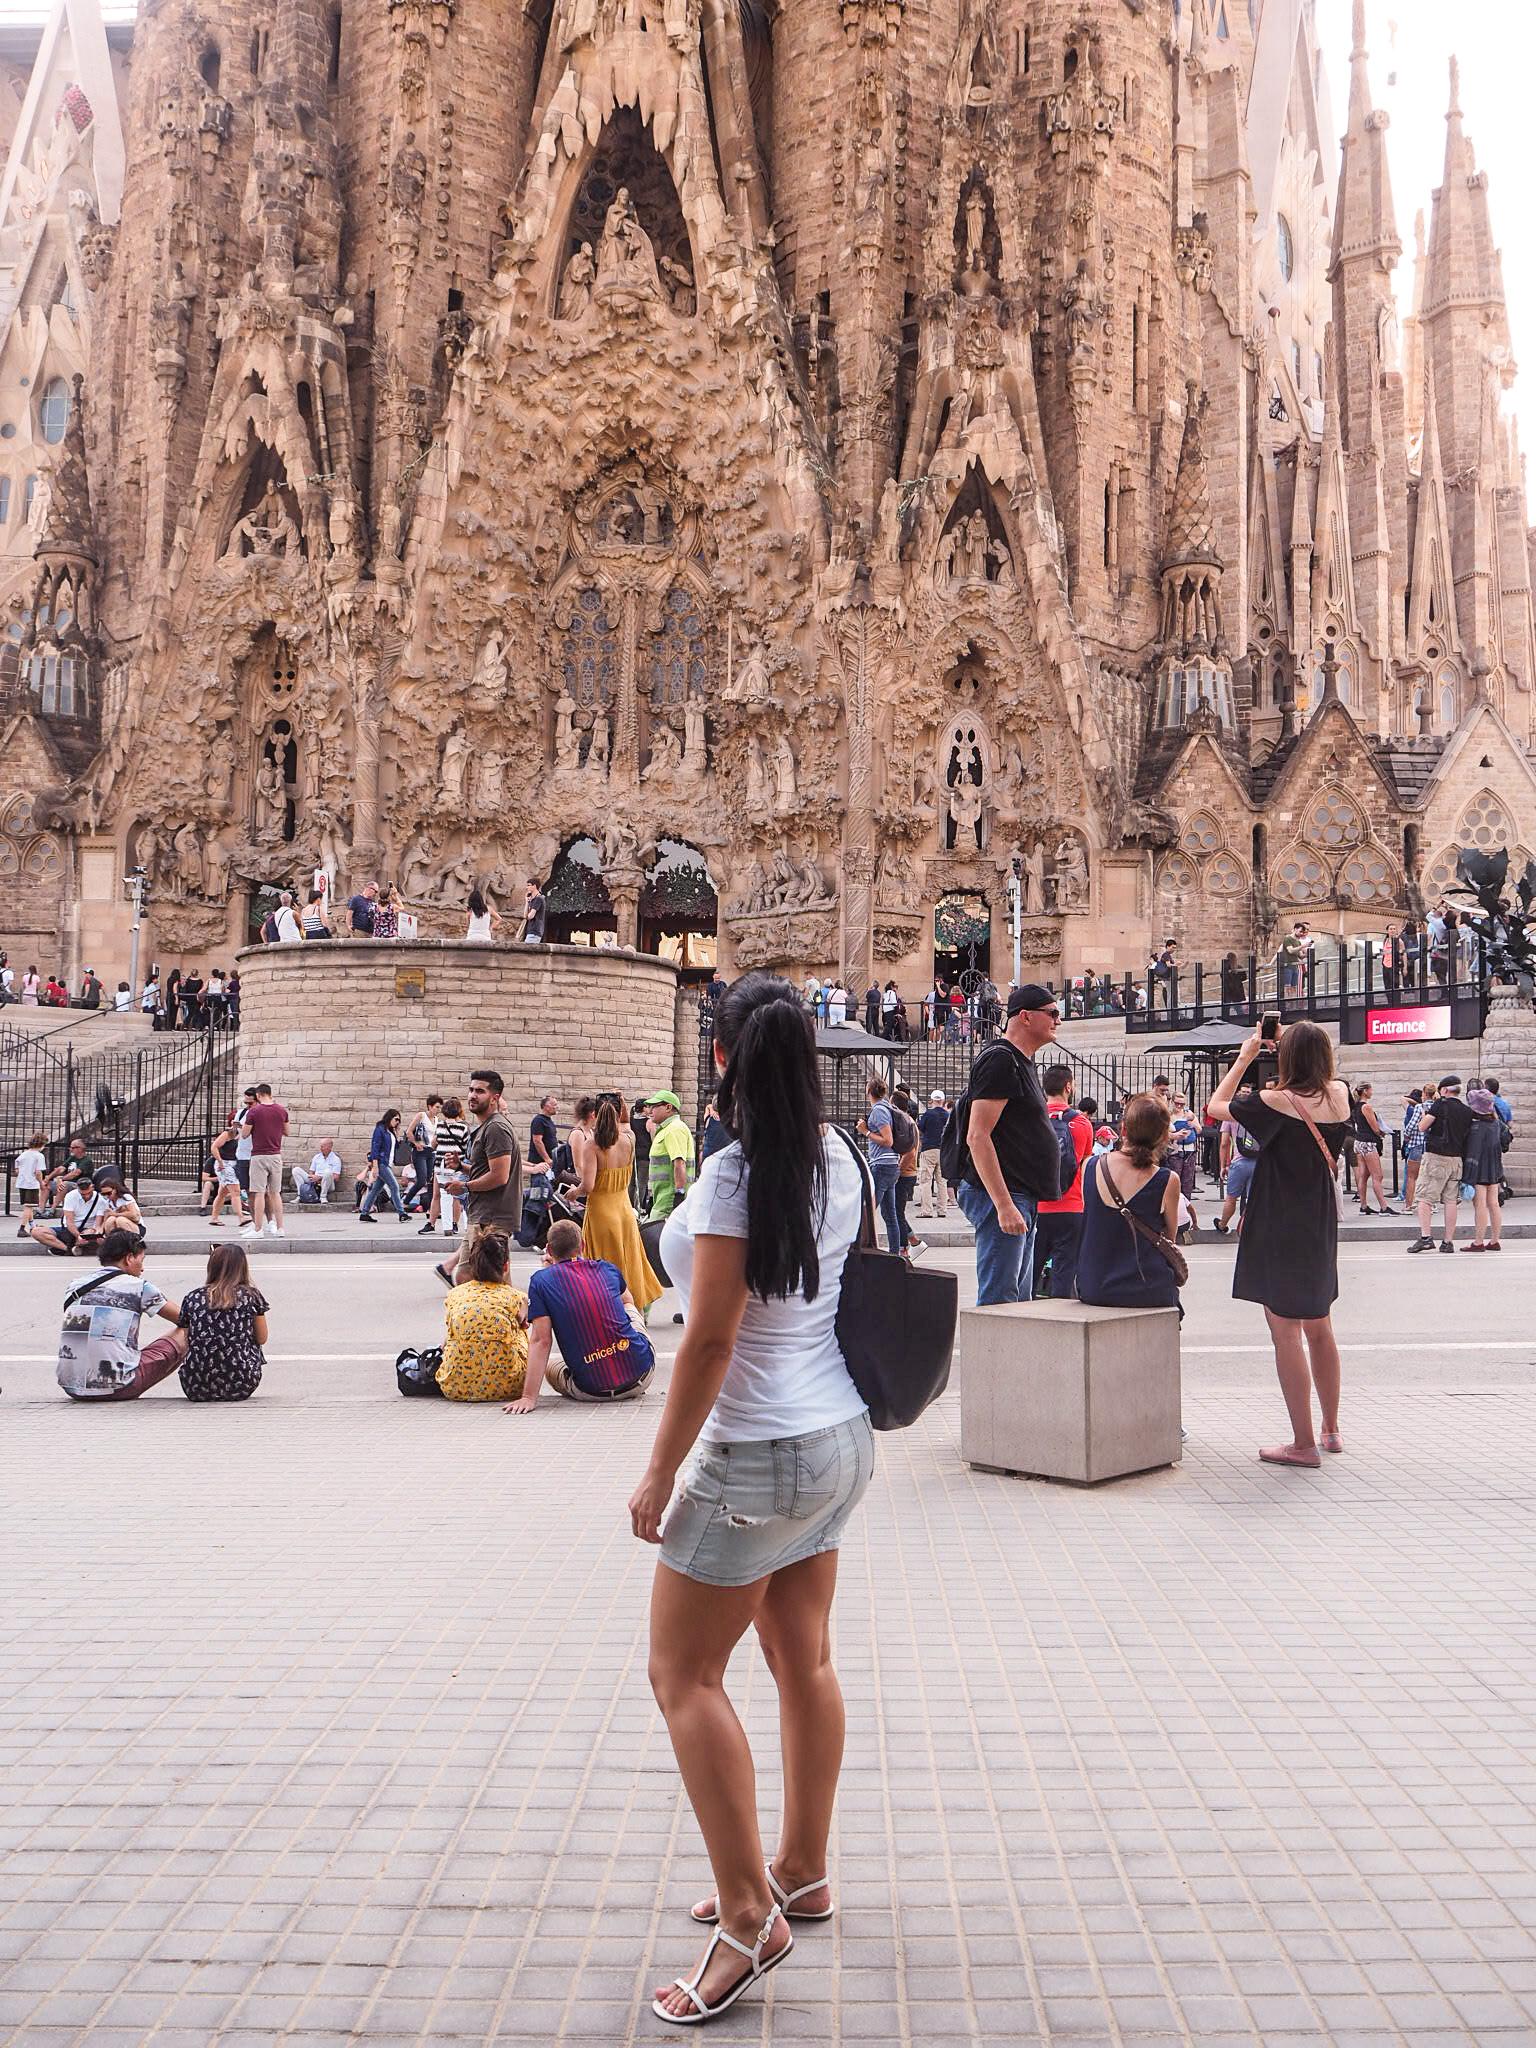 Sagrada Familia kokemukset